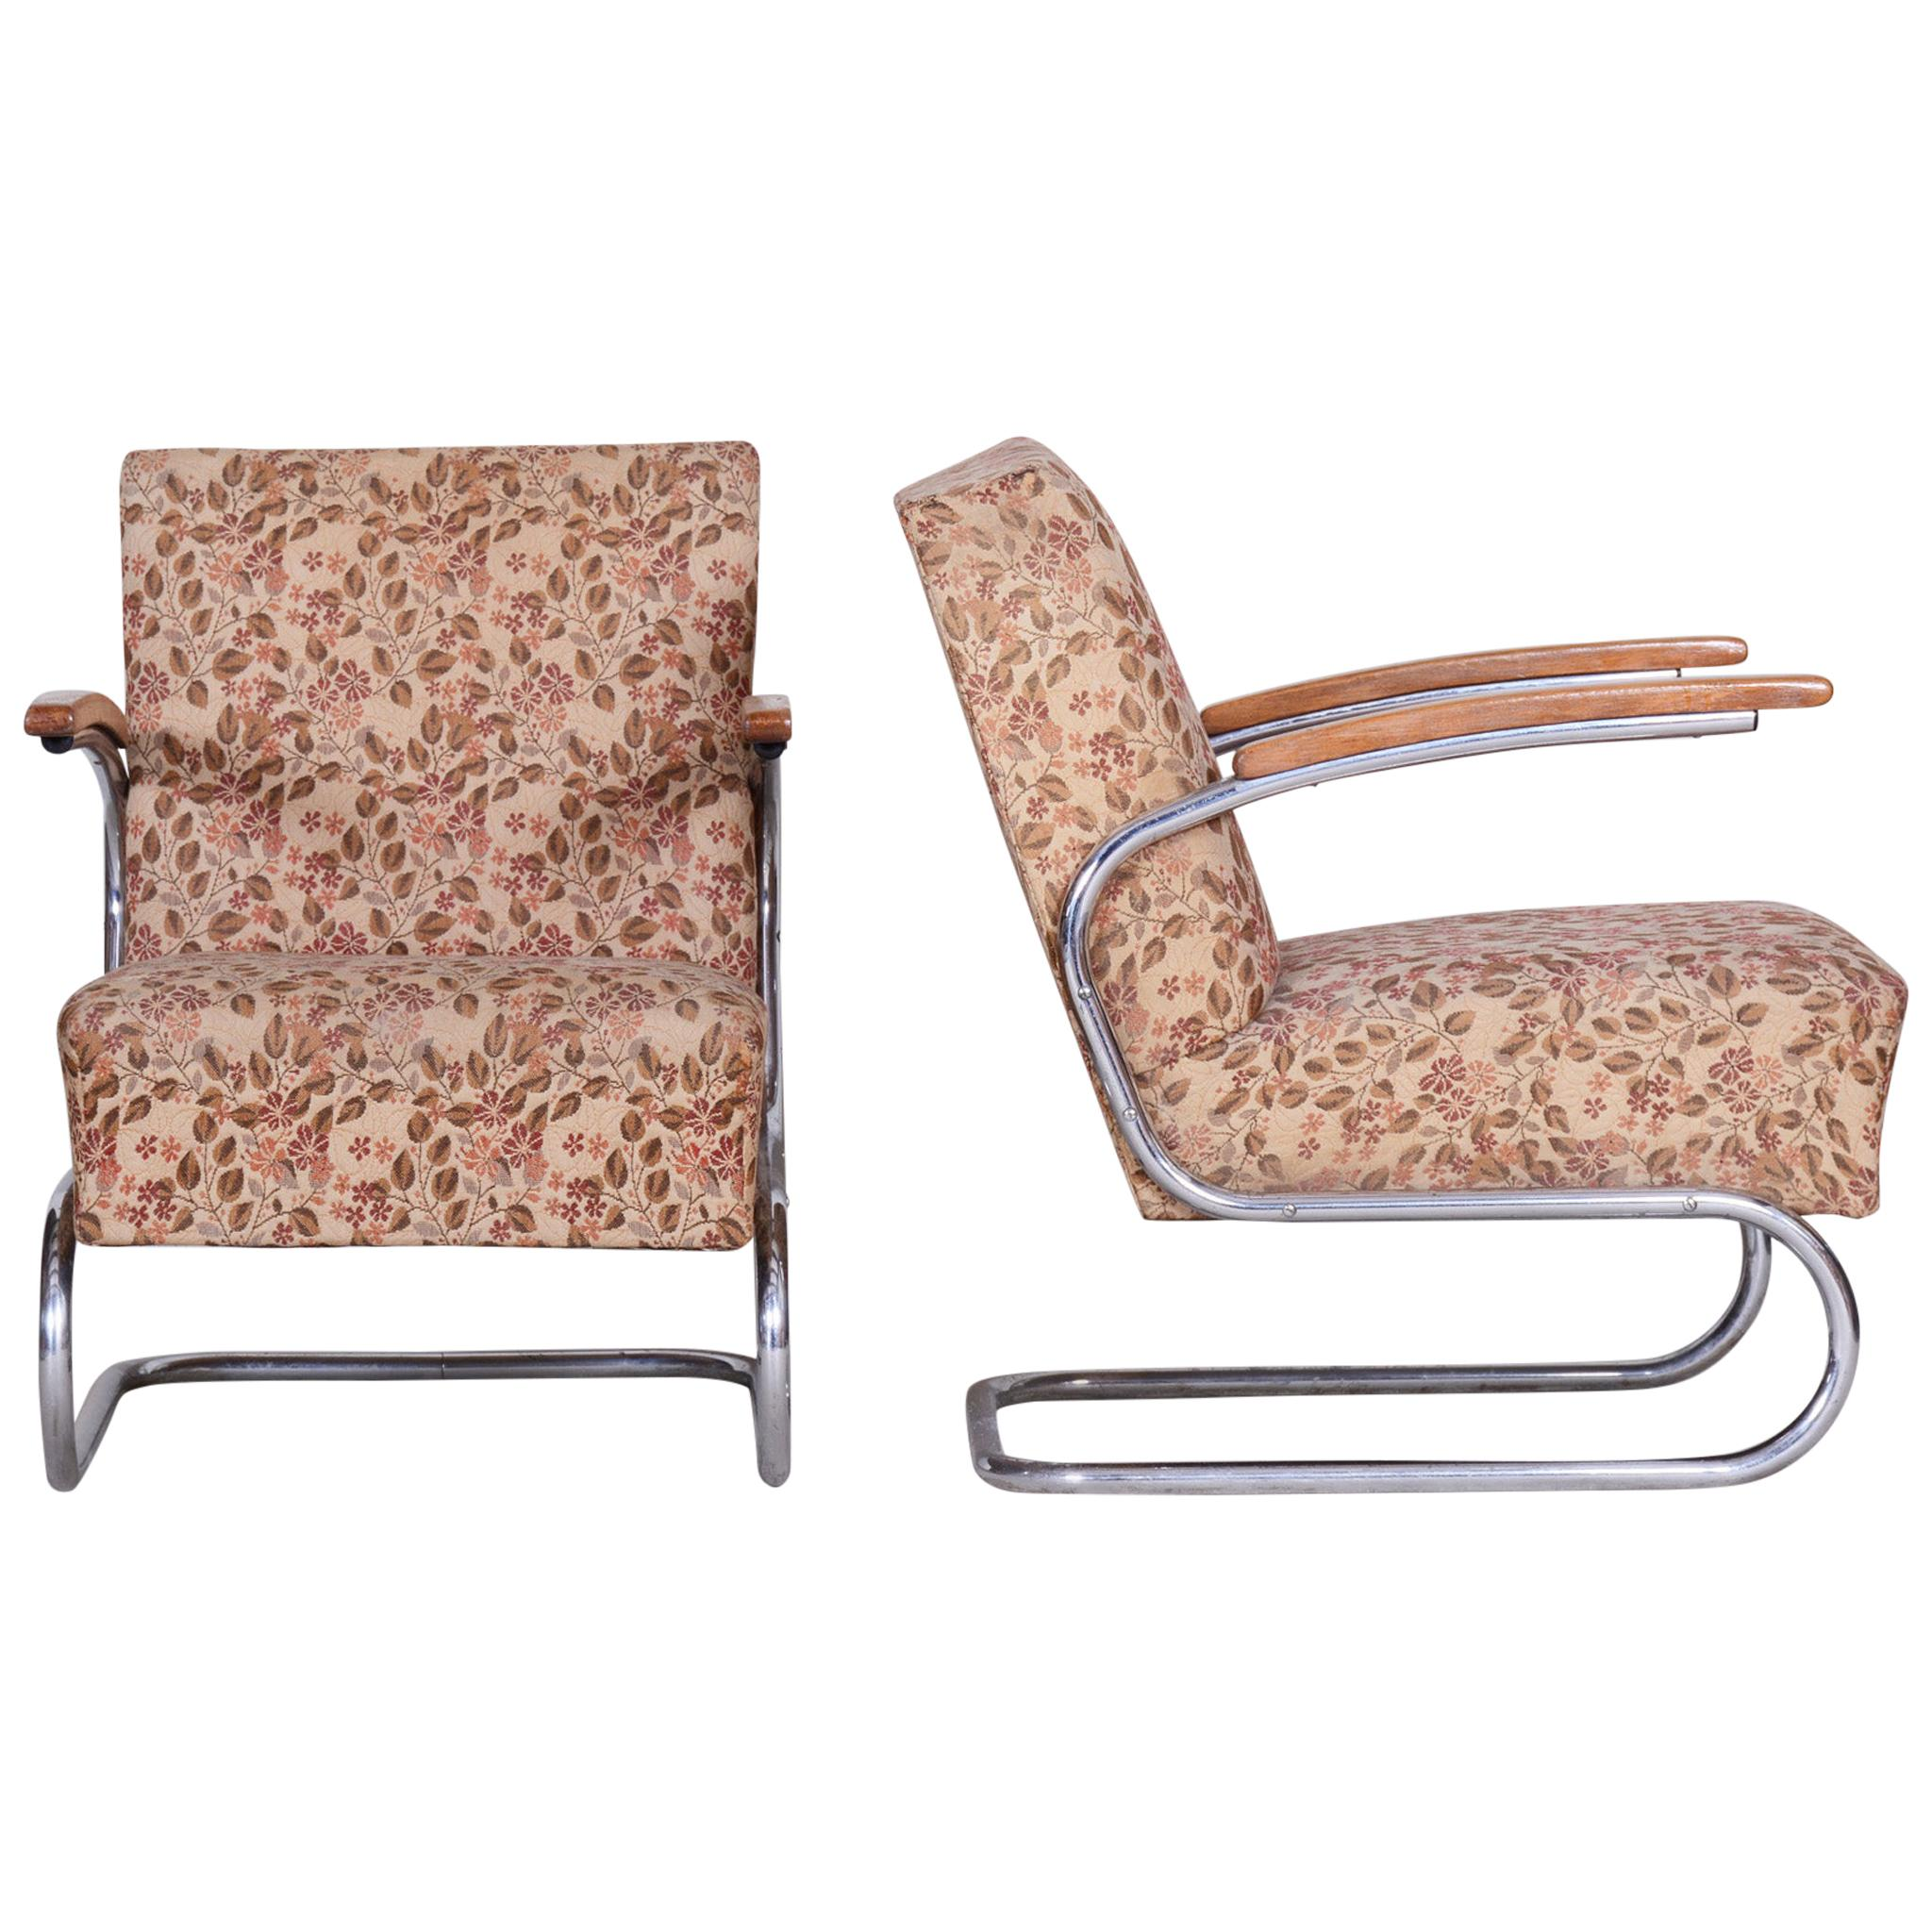 Pair of Bauhaus Tubular Chrome Armchairs by Mücke Melder, Original Fabric, 1930s